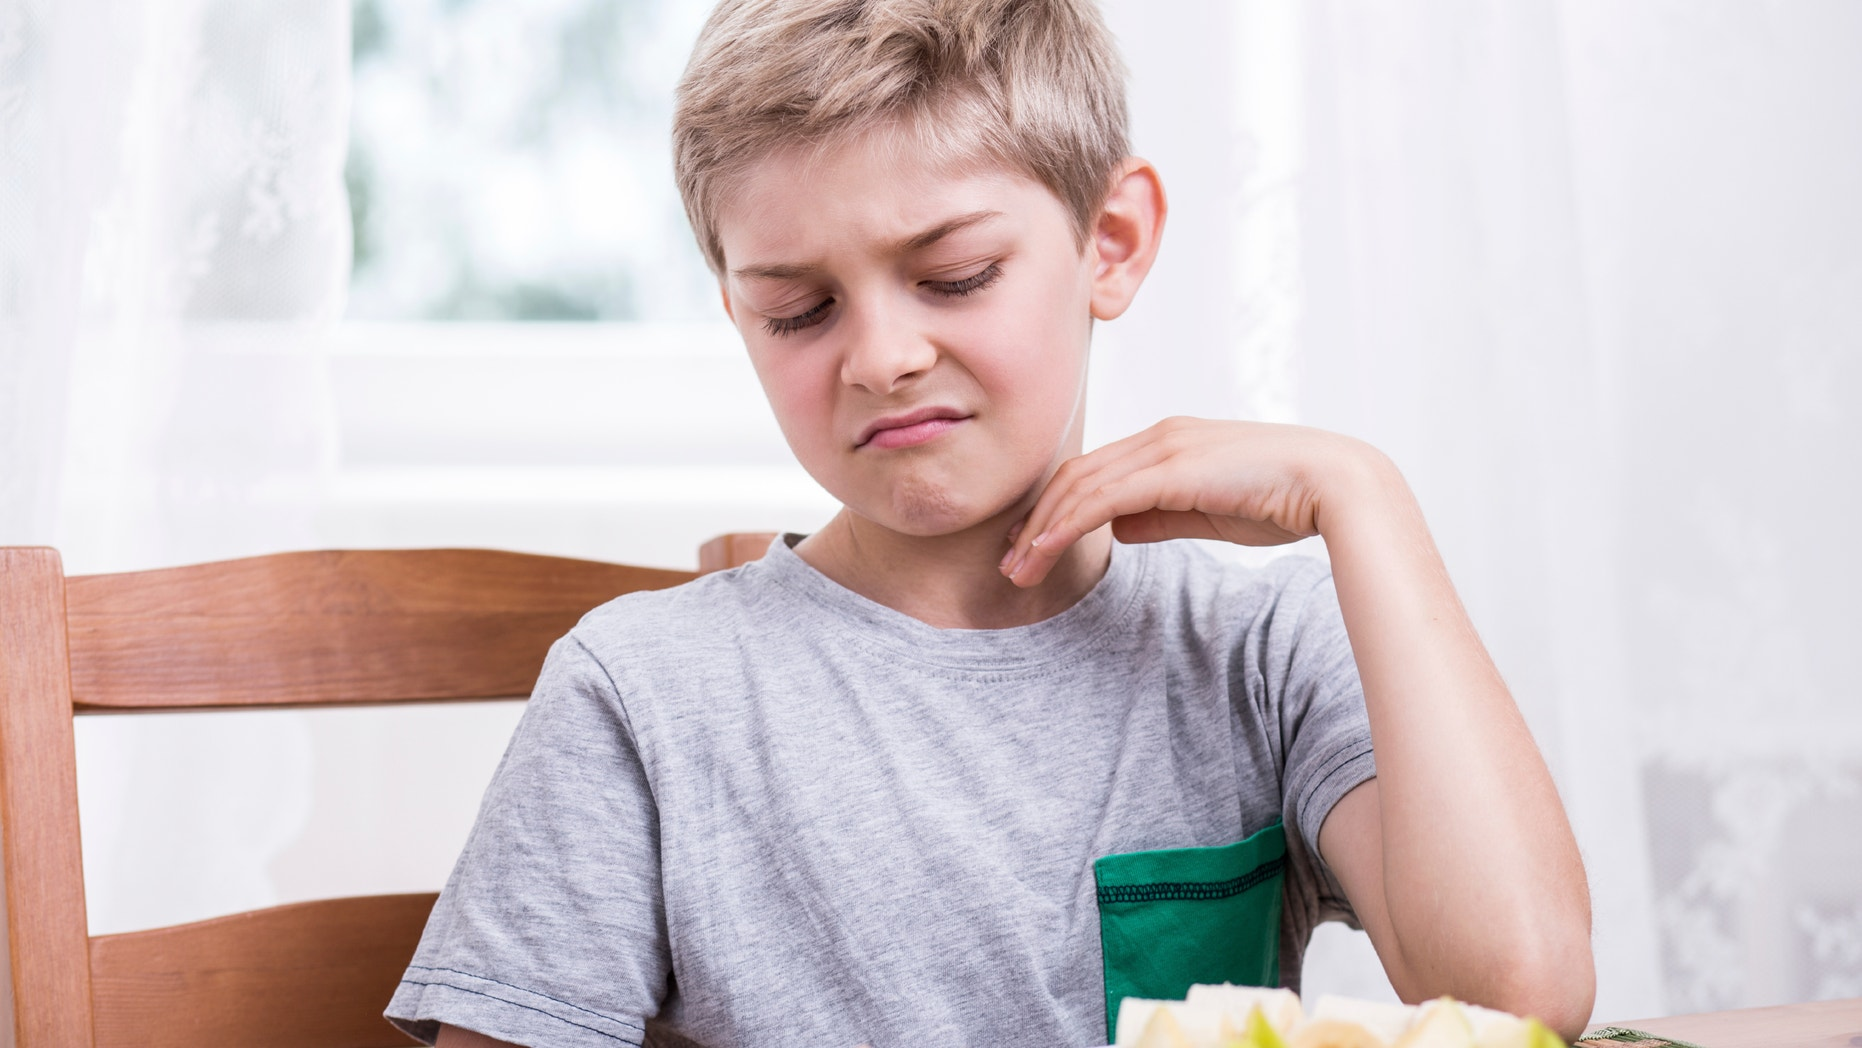 Blonde boy refusing to eat healthy apple